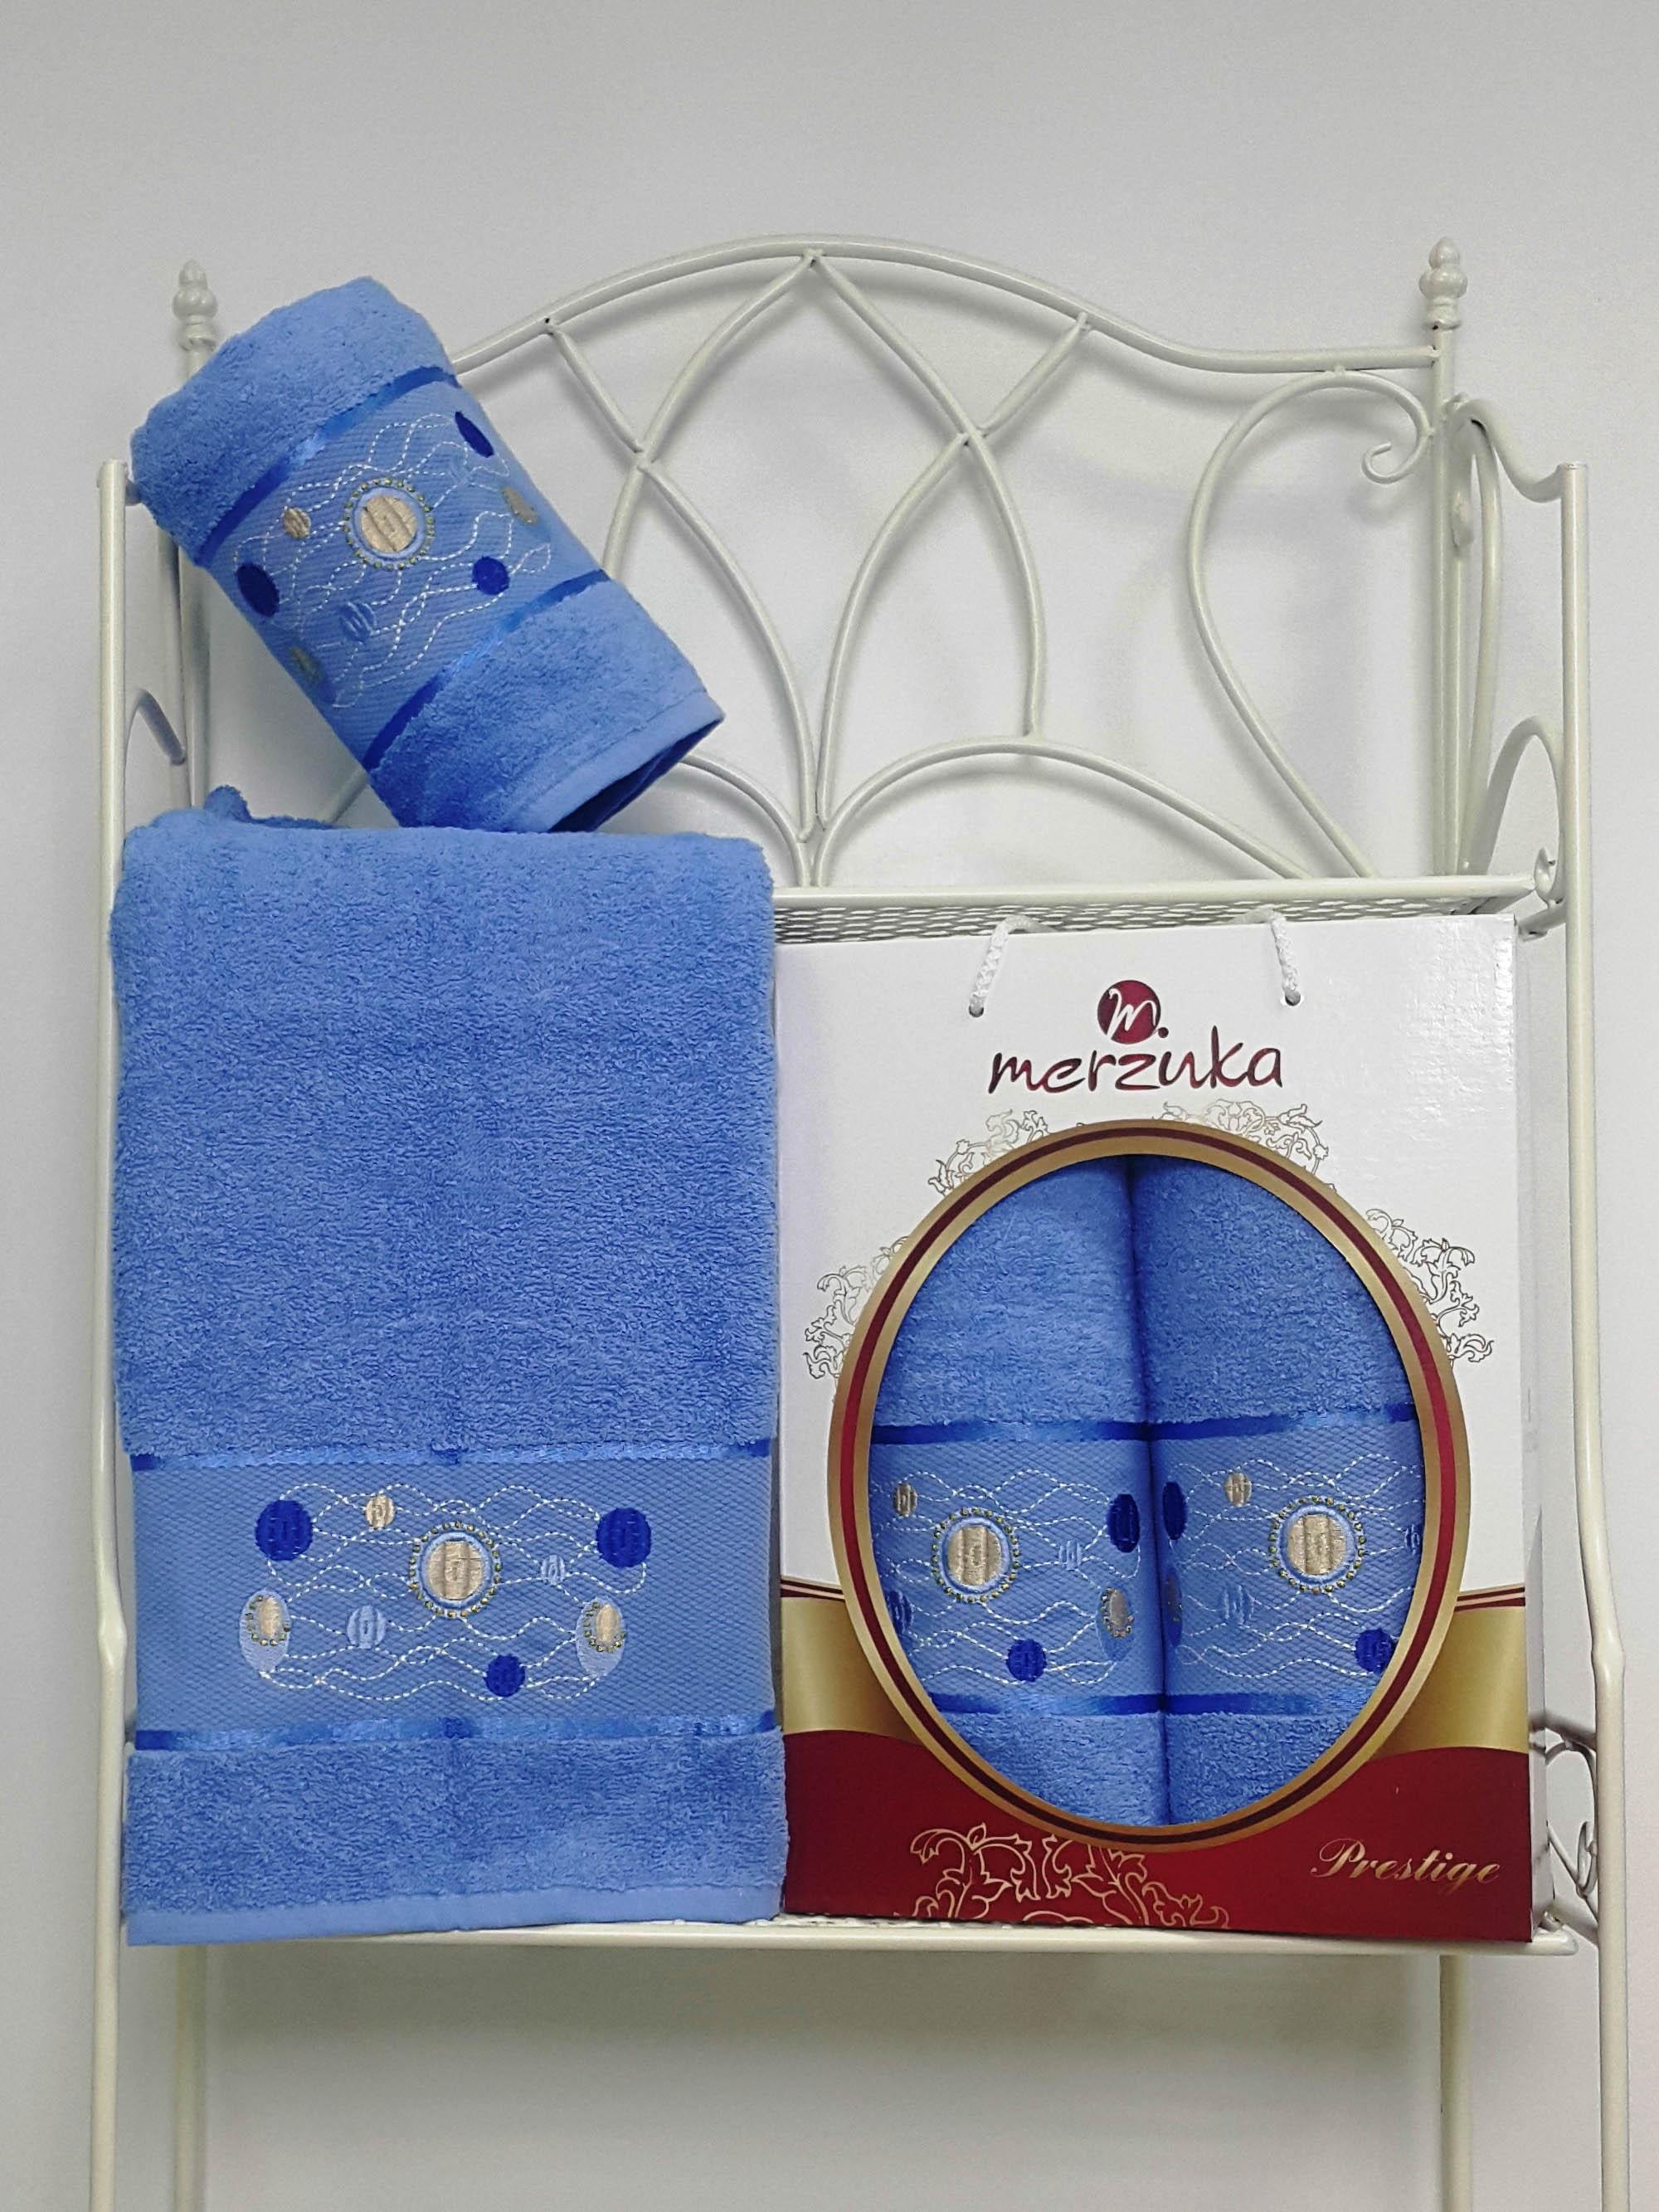 Полотенца Oran Merzuka Набор из 2 полотенец Prestij Цвет: Голубой набор из 2 полотенец merzuka sakura 50х90 70х140 8430 кремовый